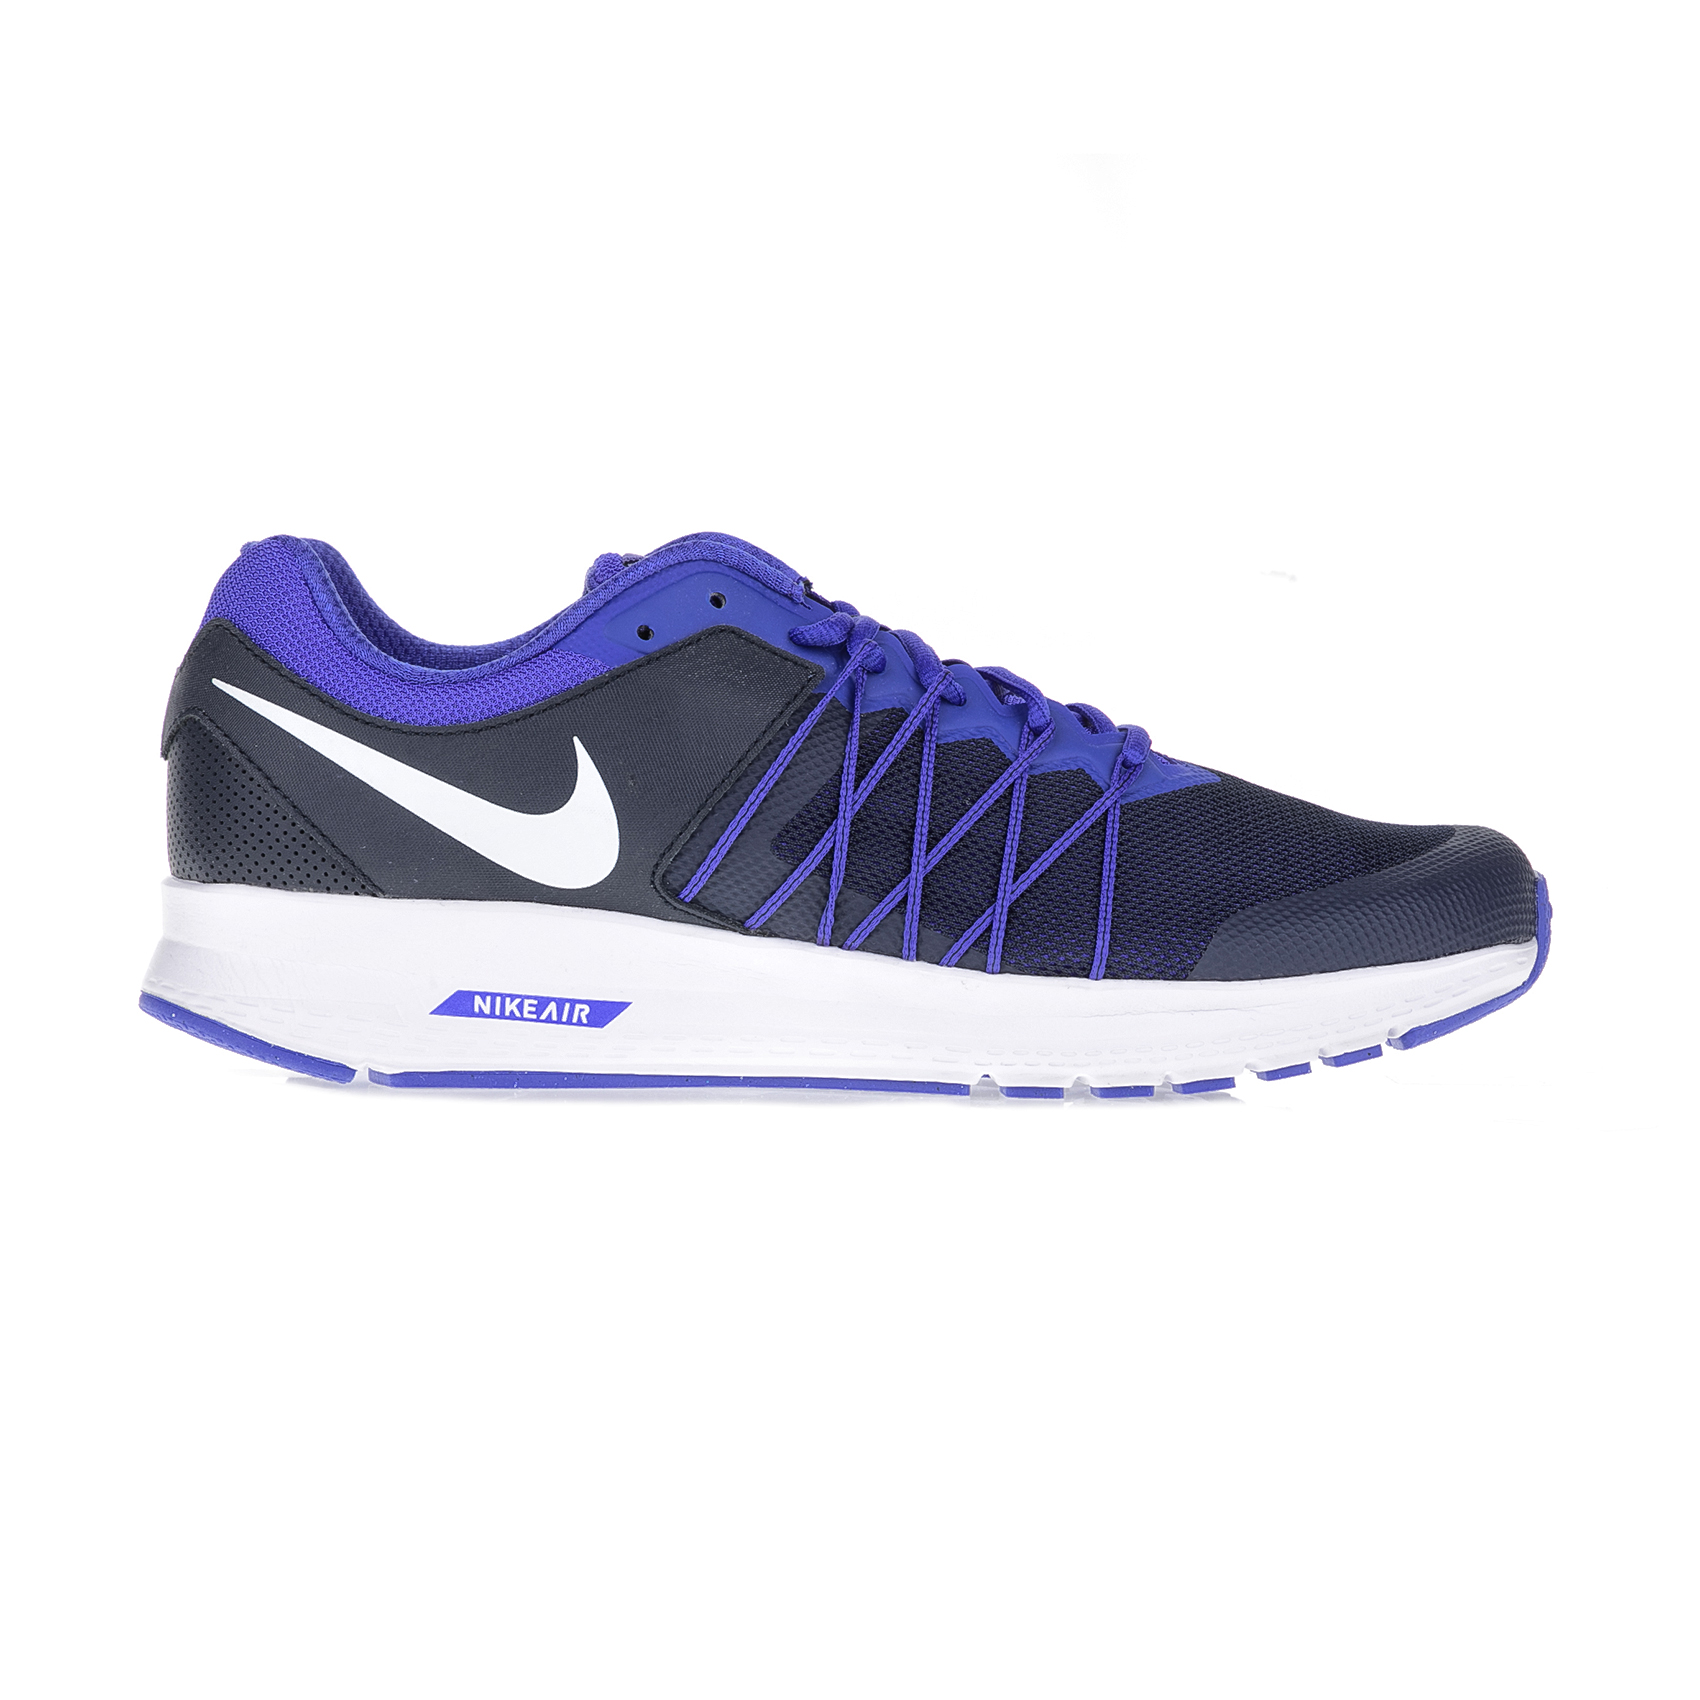 NIKE – Ανδρικά αθλητικά παπούτσια NIKE AIR RELENTLESS 6 μπλε-μοβ